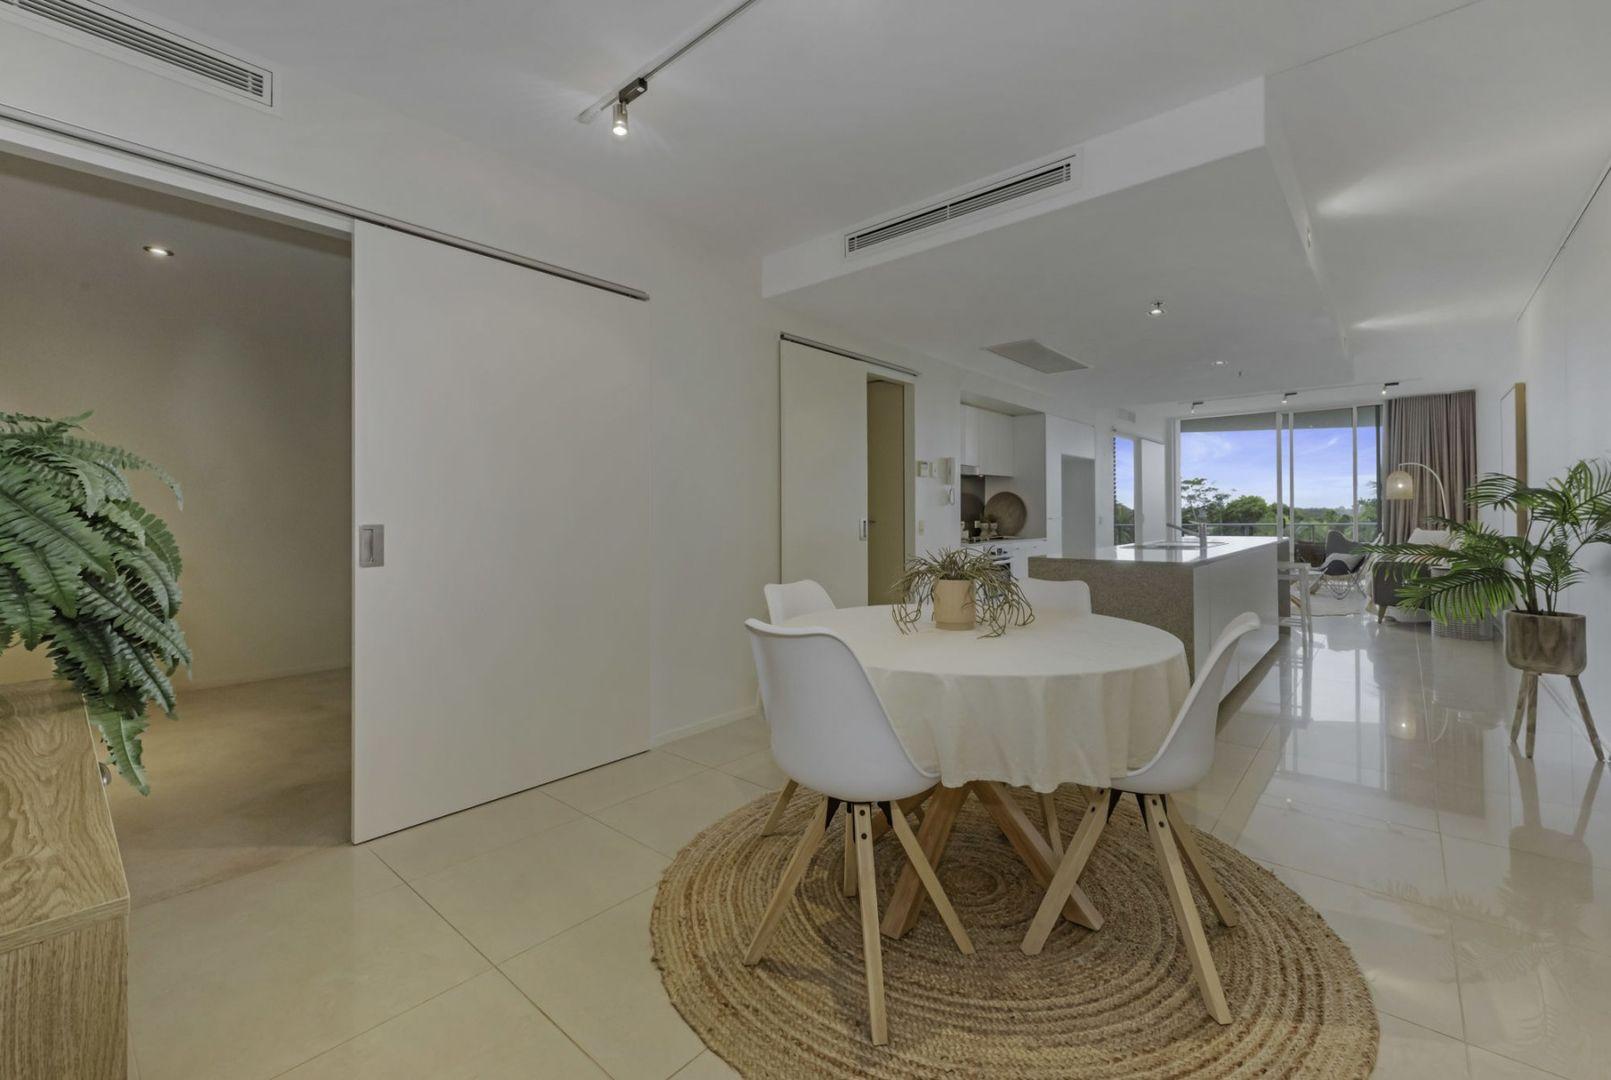 25/26 River Street, Mackay QLD 4740, Image 1